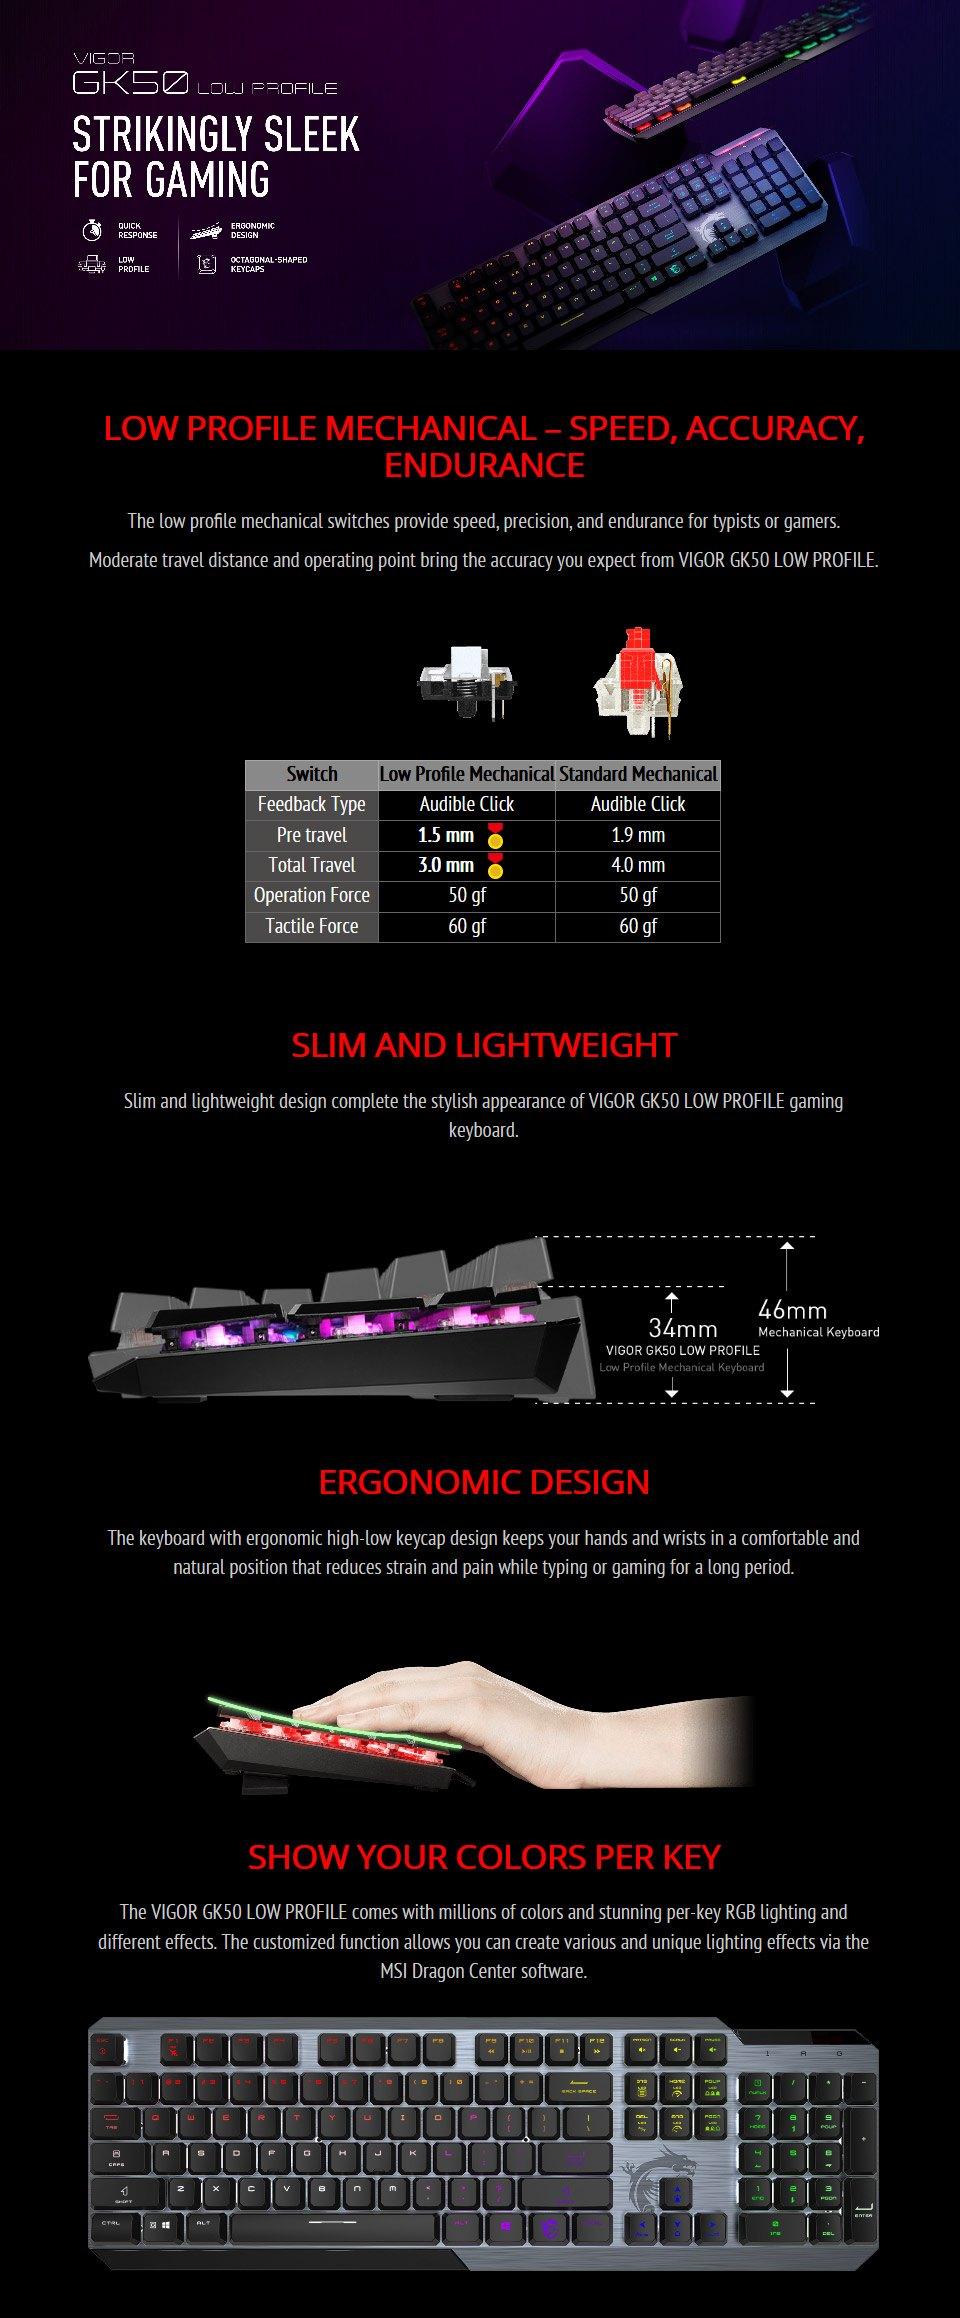 MSI Vigor GK50 Low Profile Mechanical Keyboard features